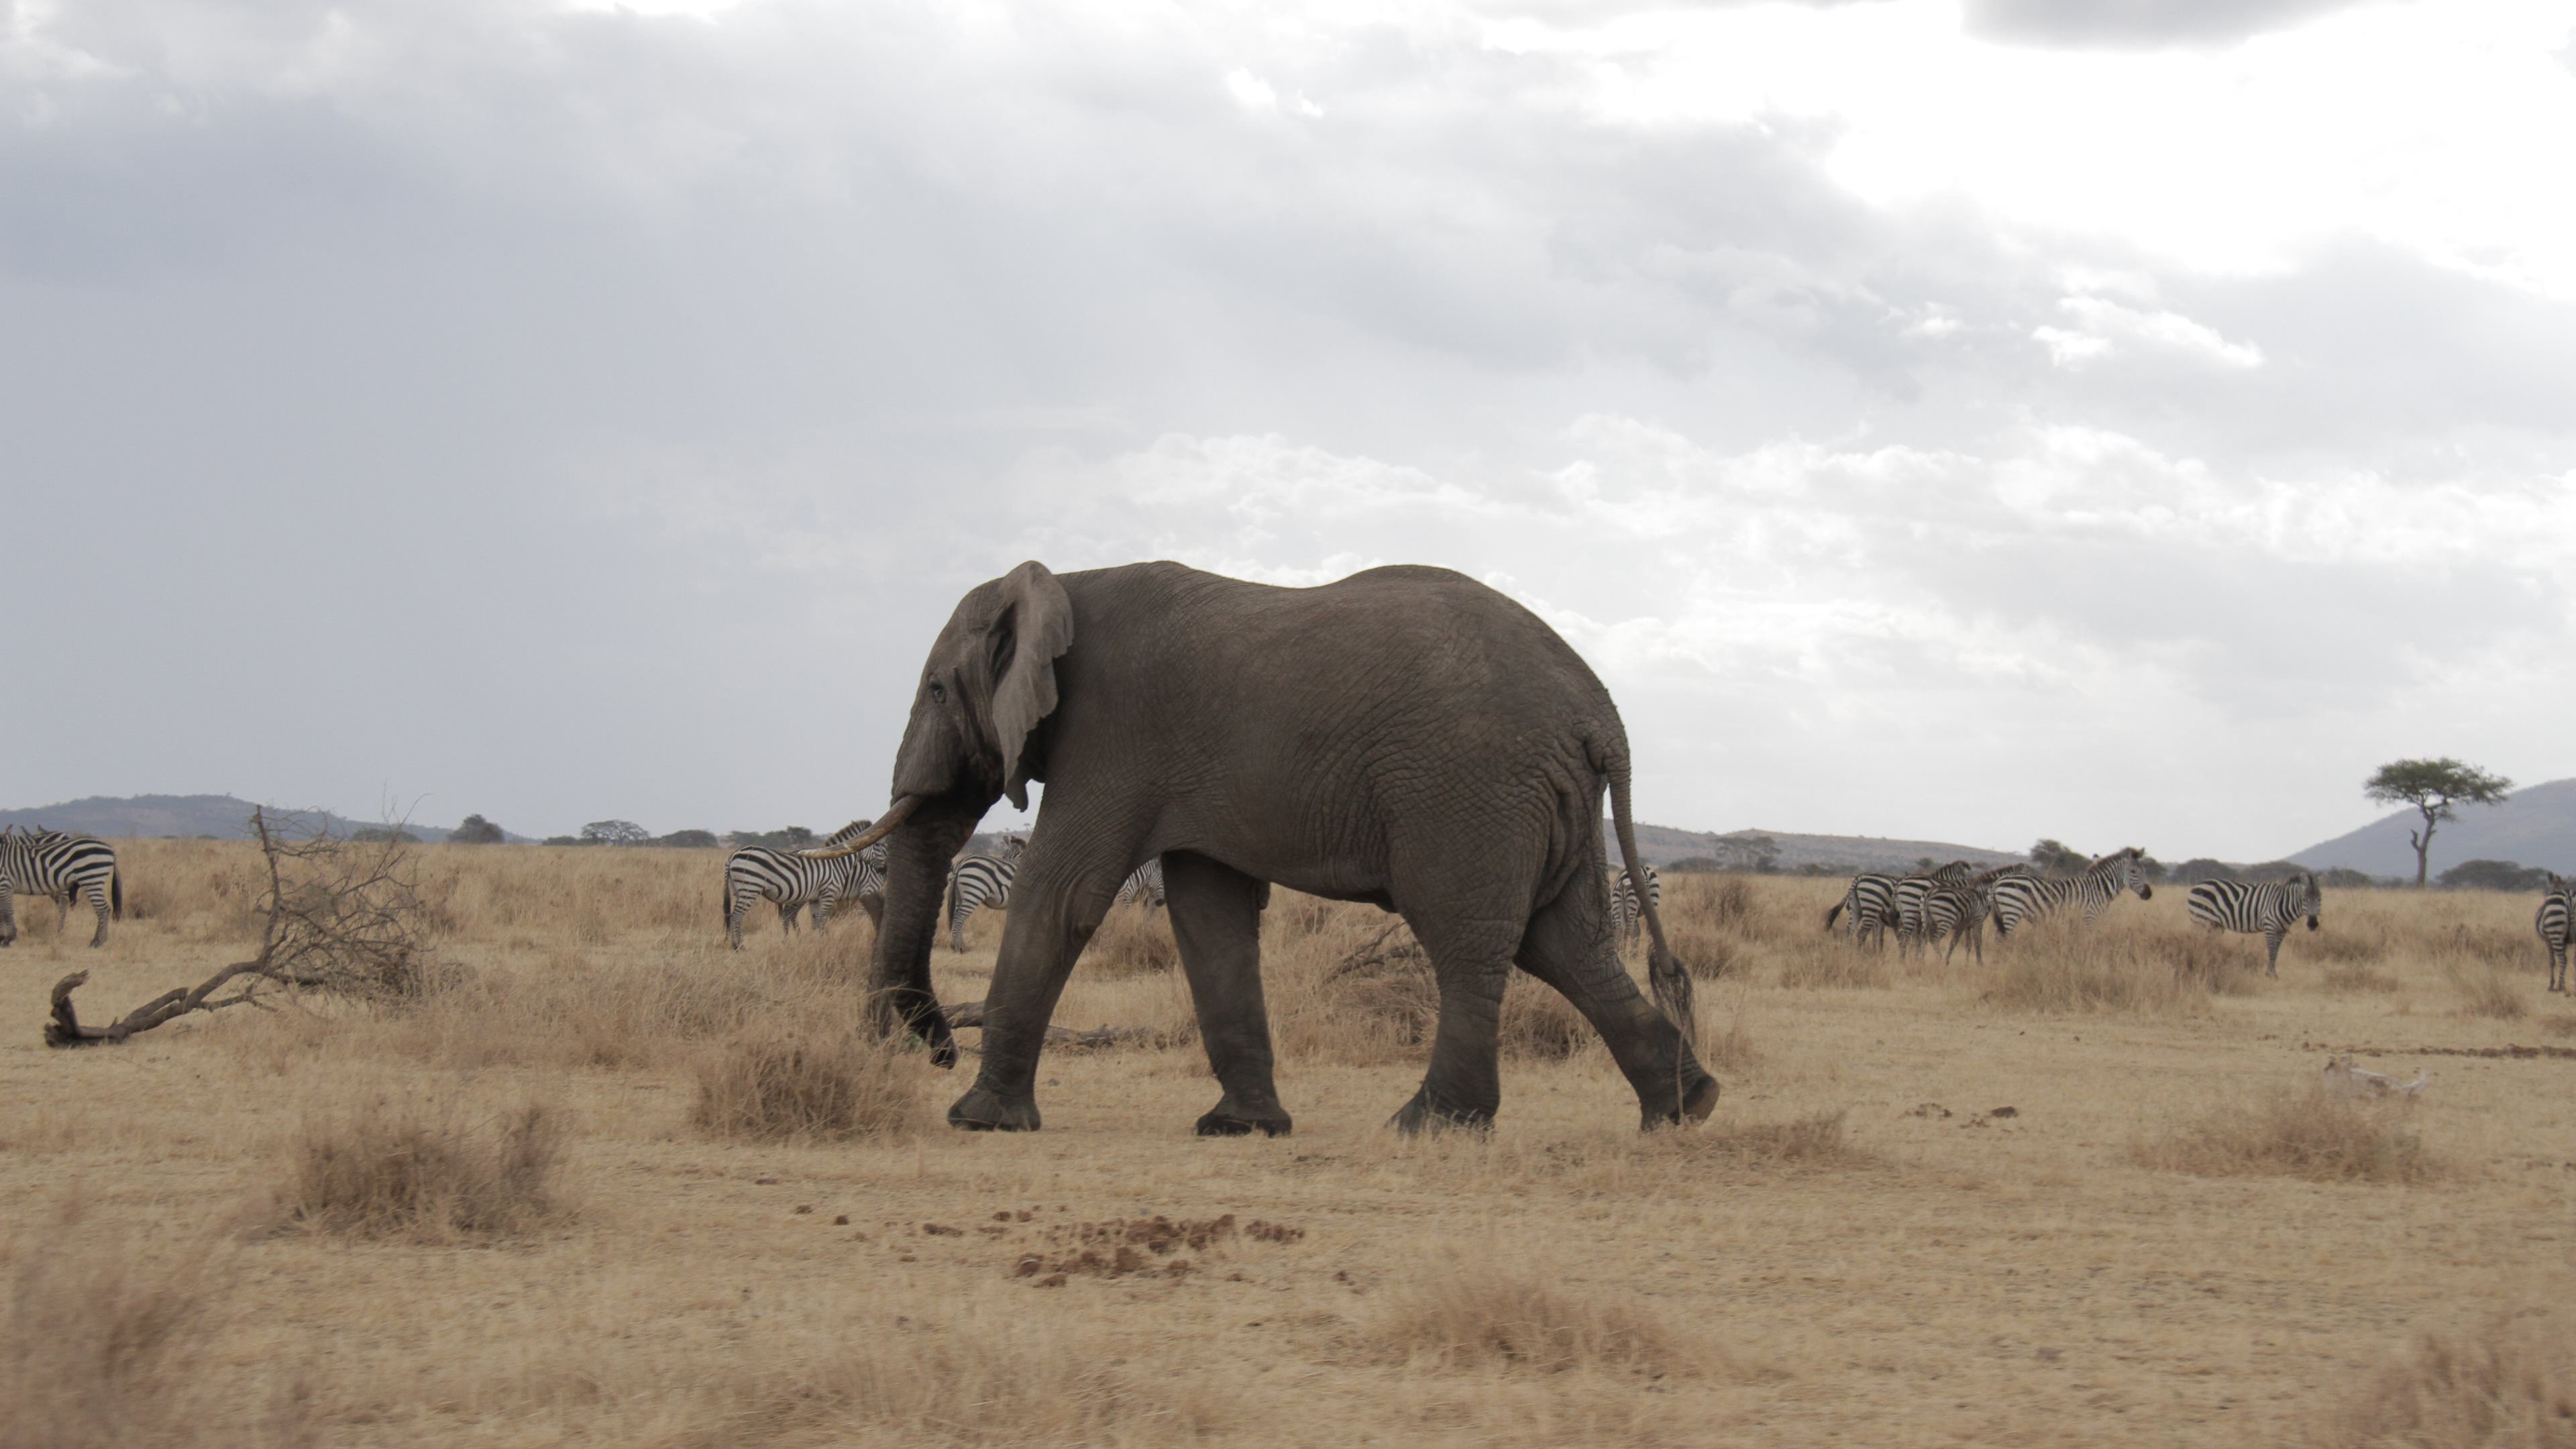 Elephant Wallpaper (73+ images)